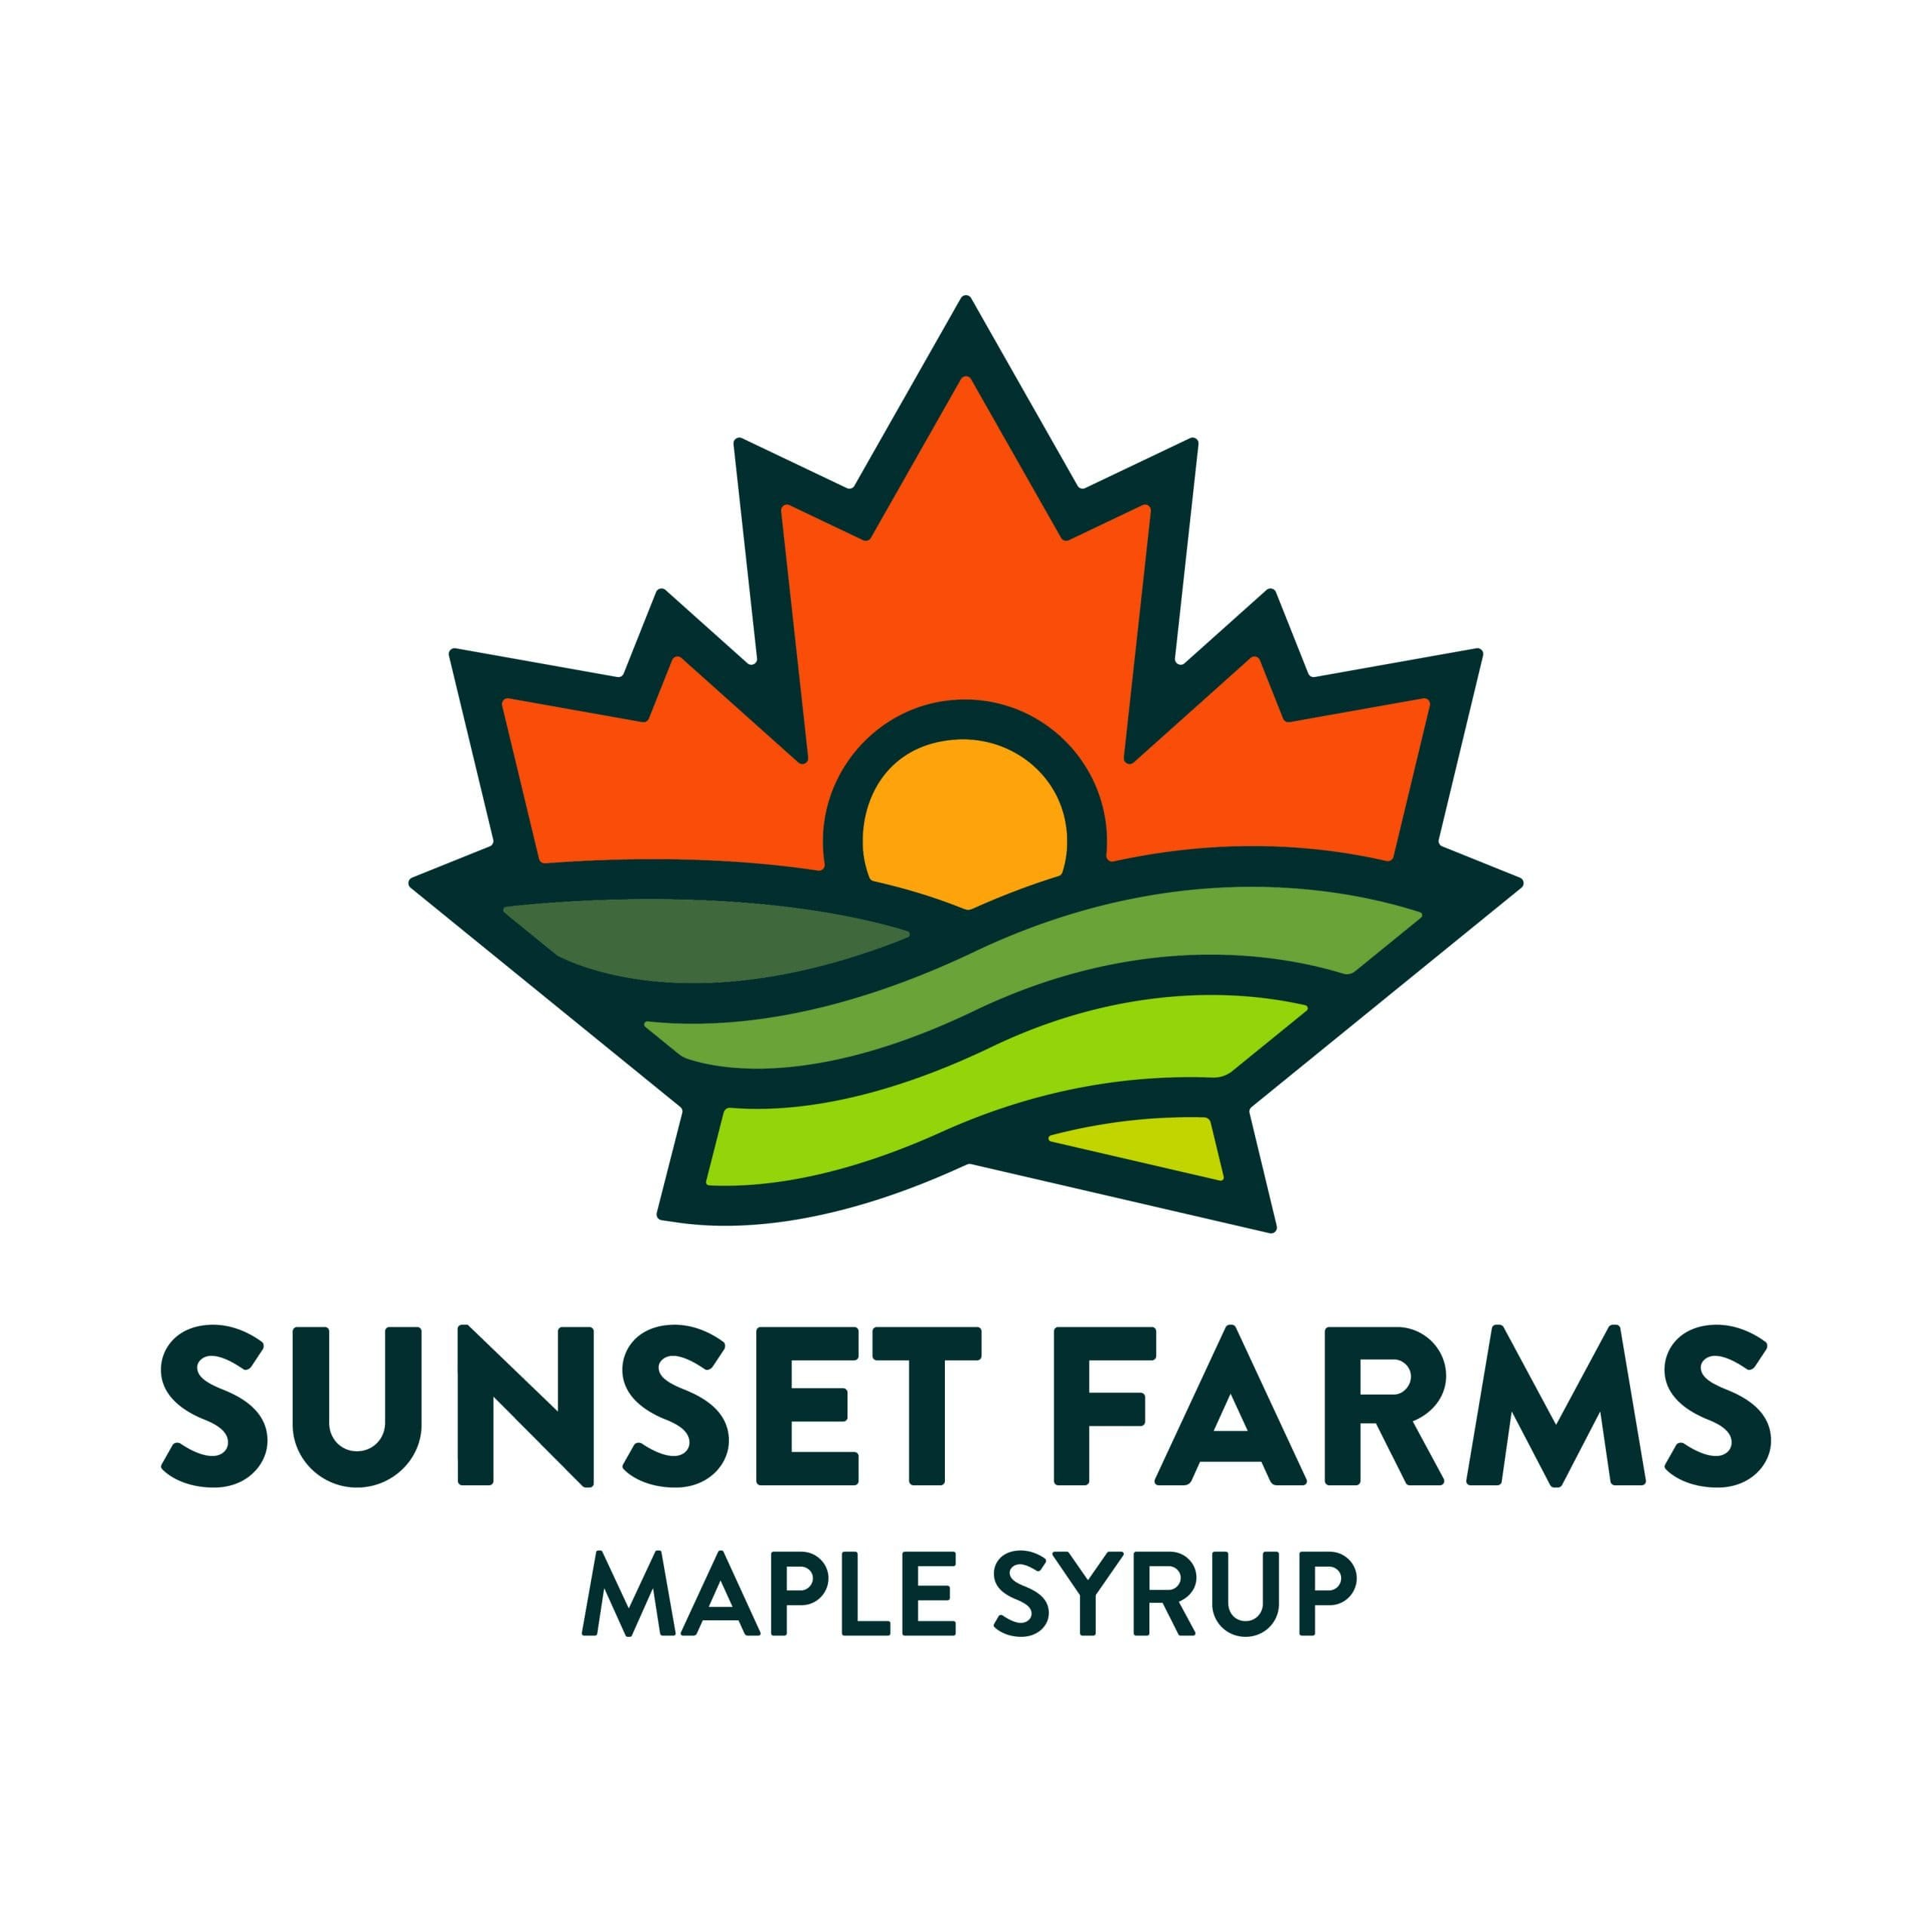 Sunset Farm Logo Design